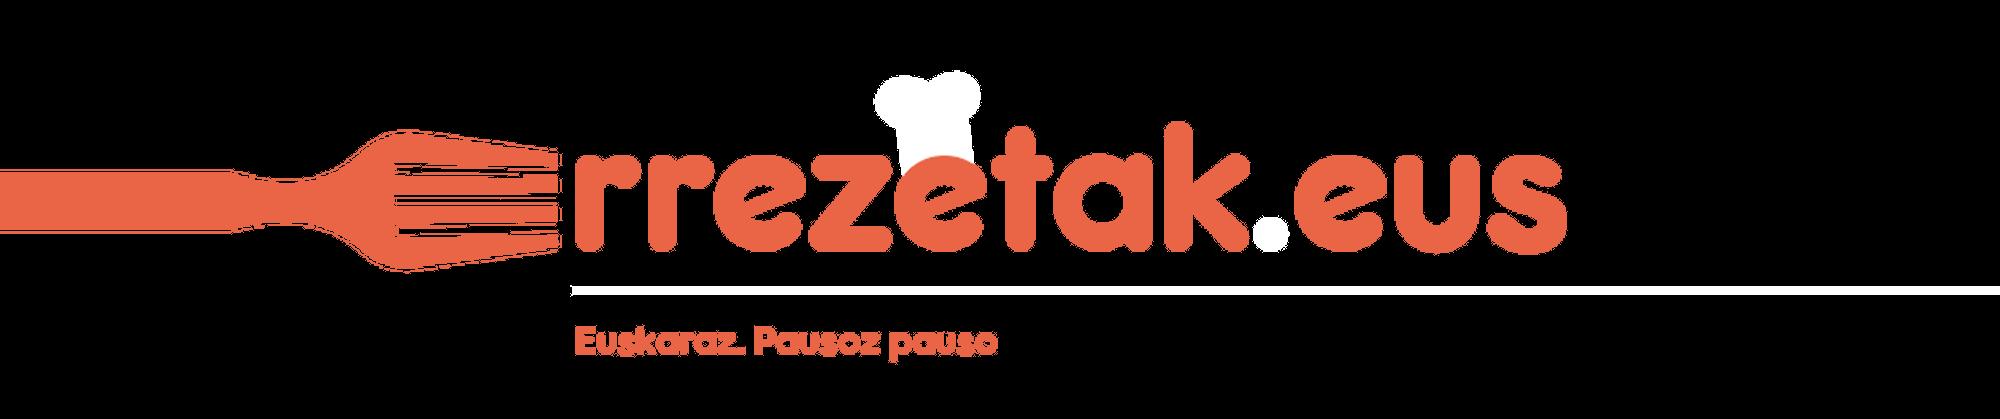 logo handia_2000x419